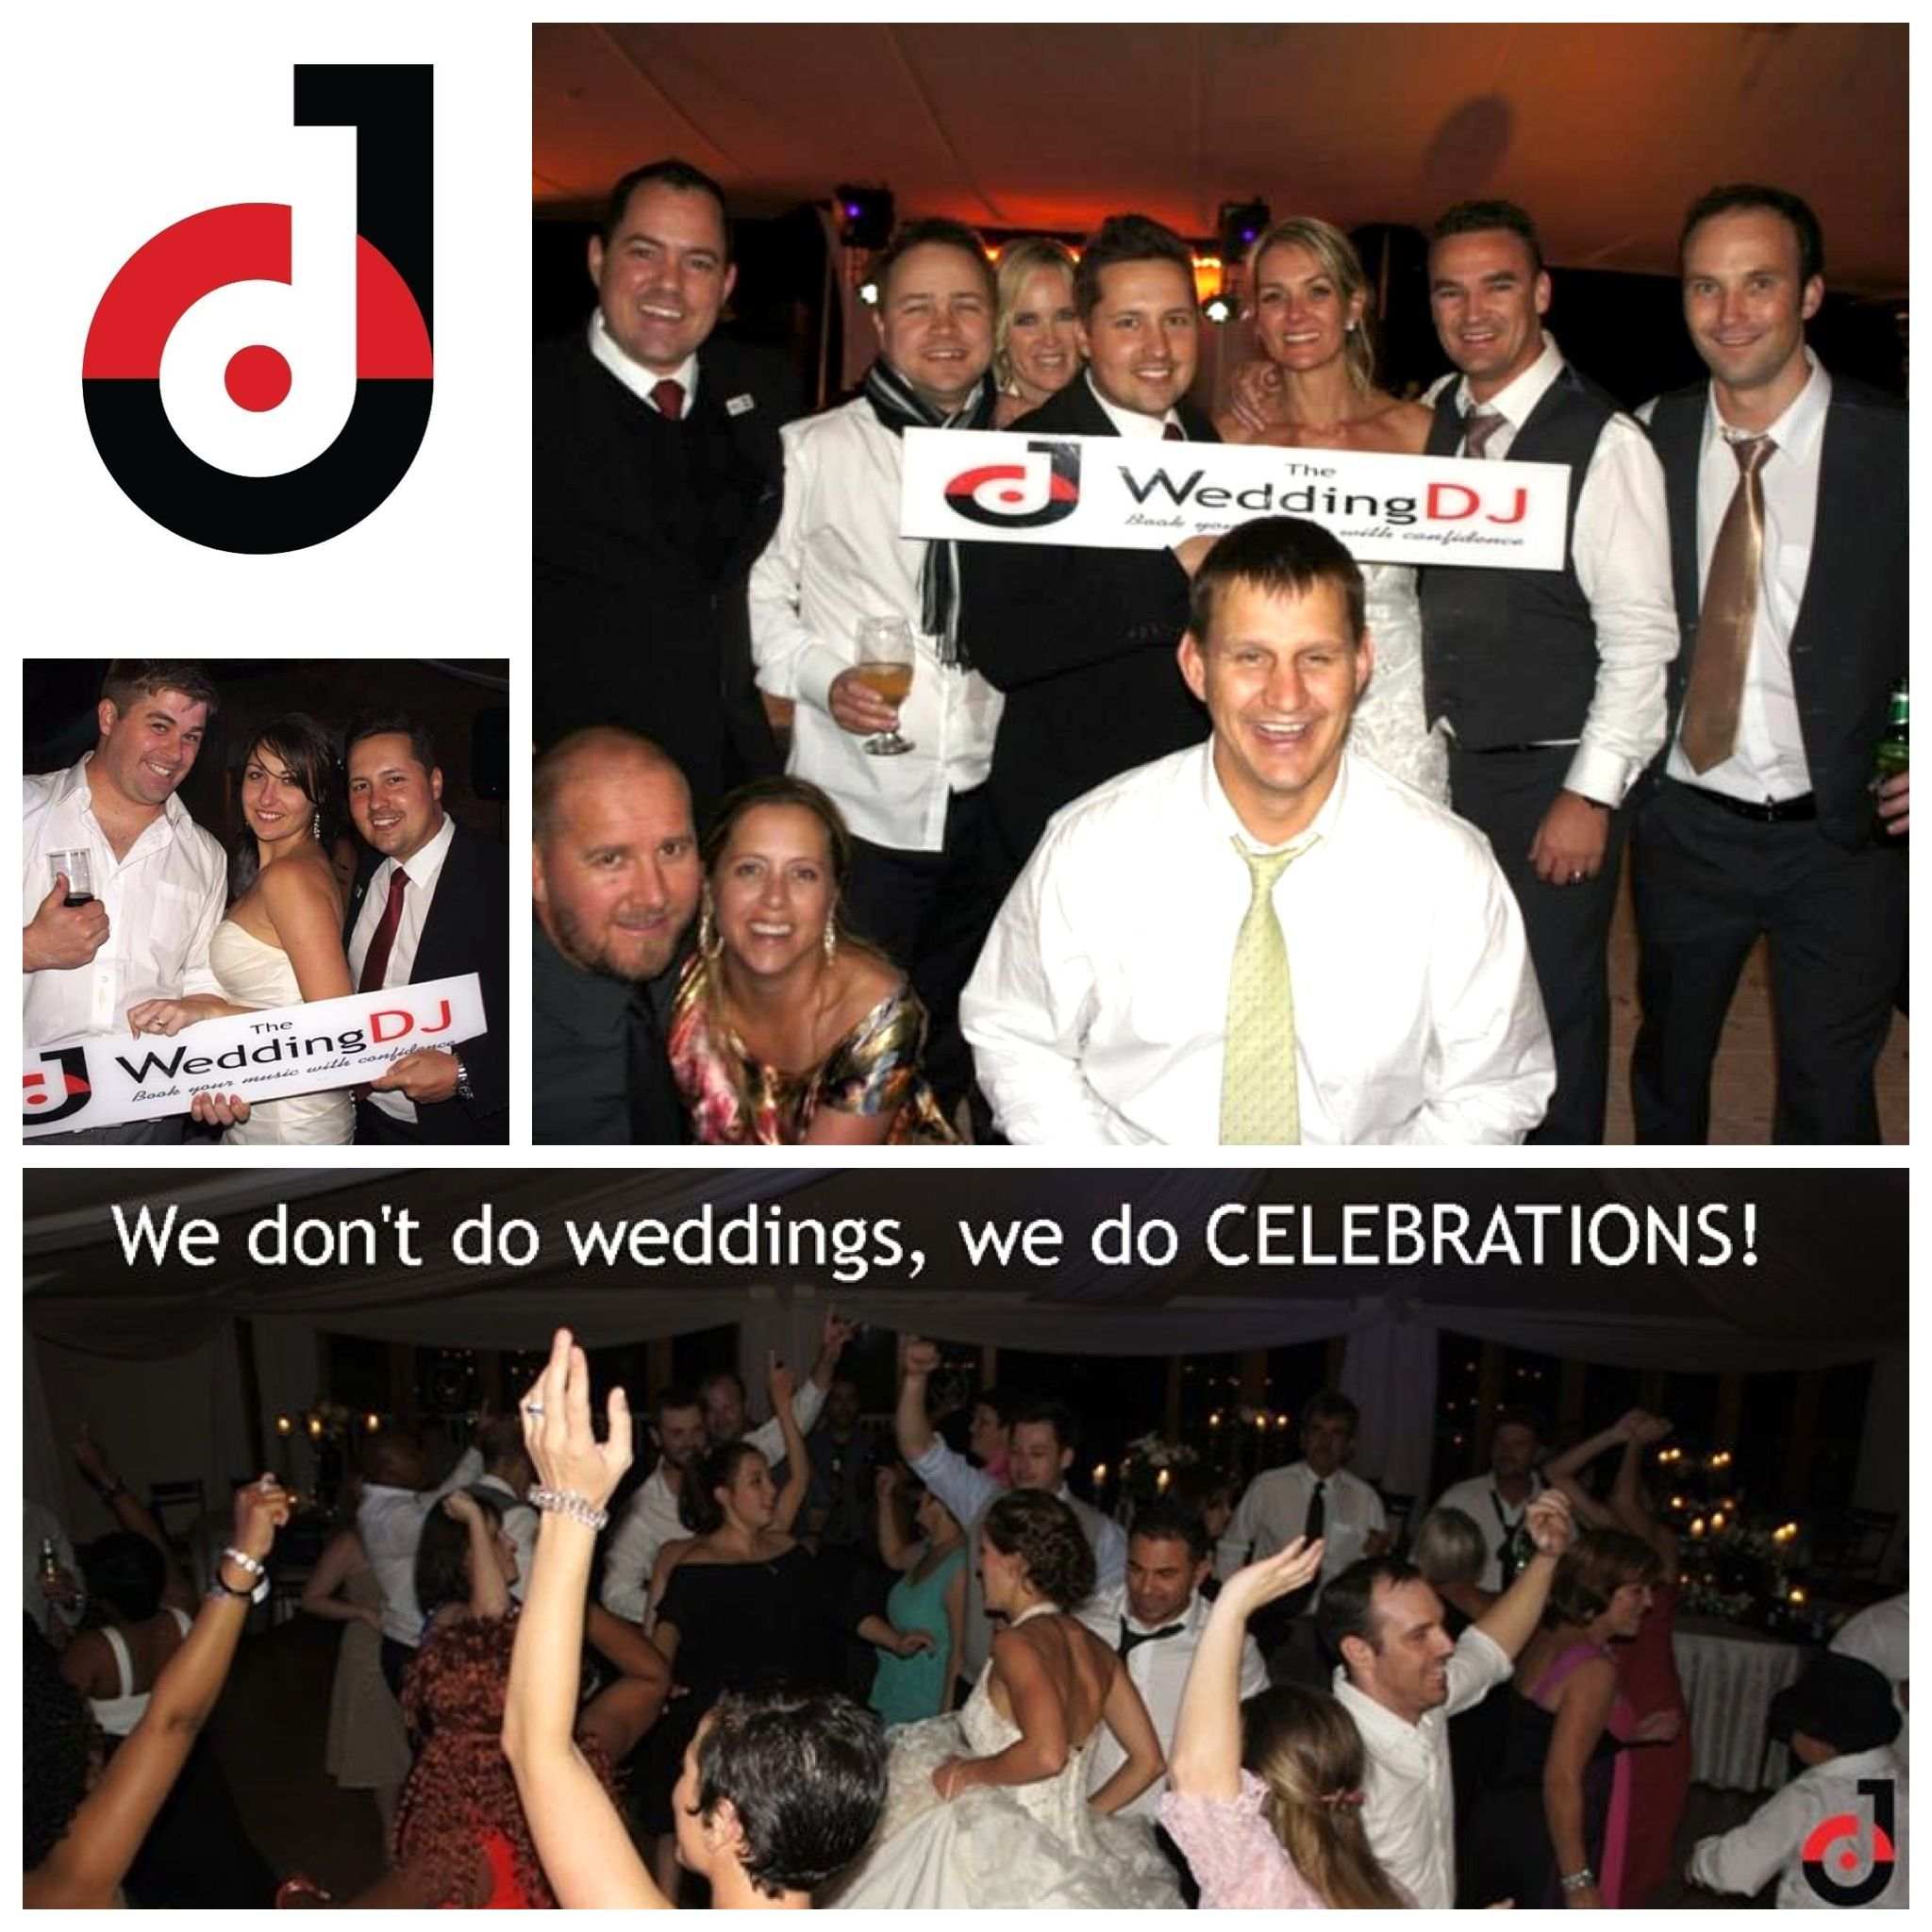 The Wedding DJ - Let's Celebrate